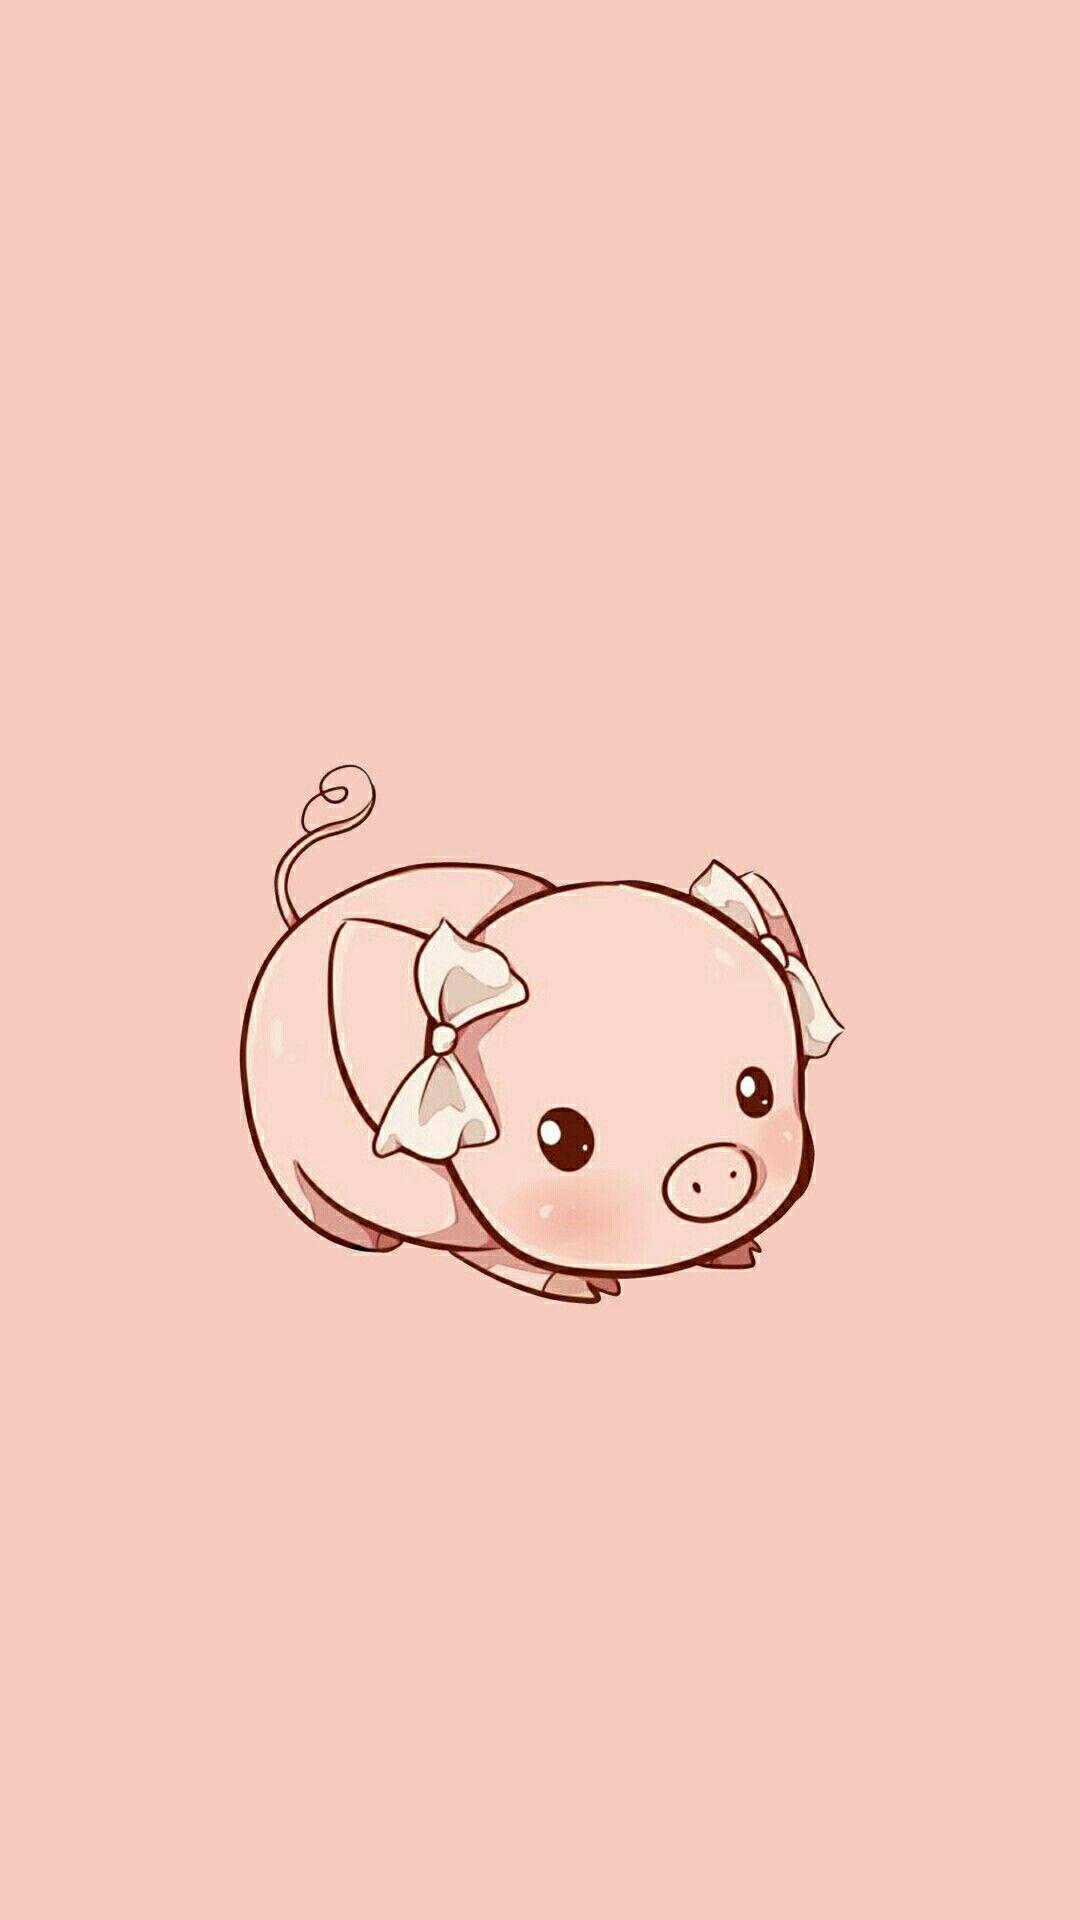 Kawaii Hd Cute Wallpapers Pig Wallpaper Cute Cartoon Wallpapers